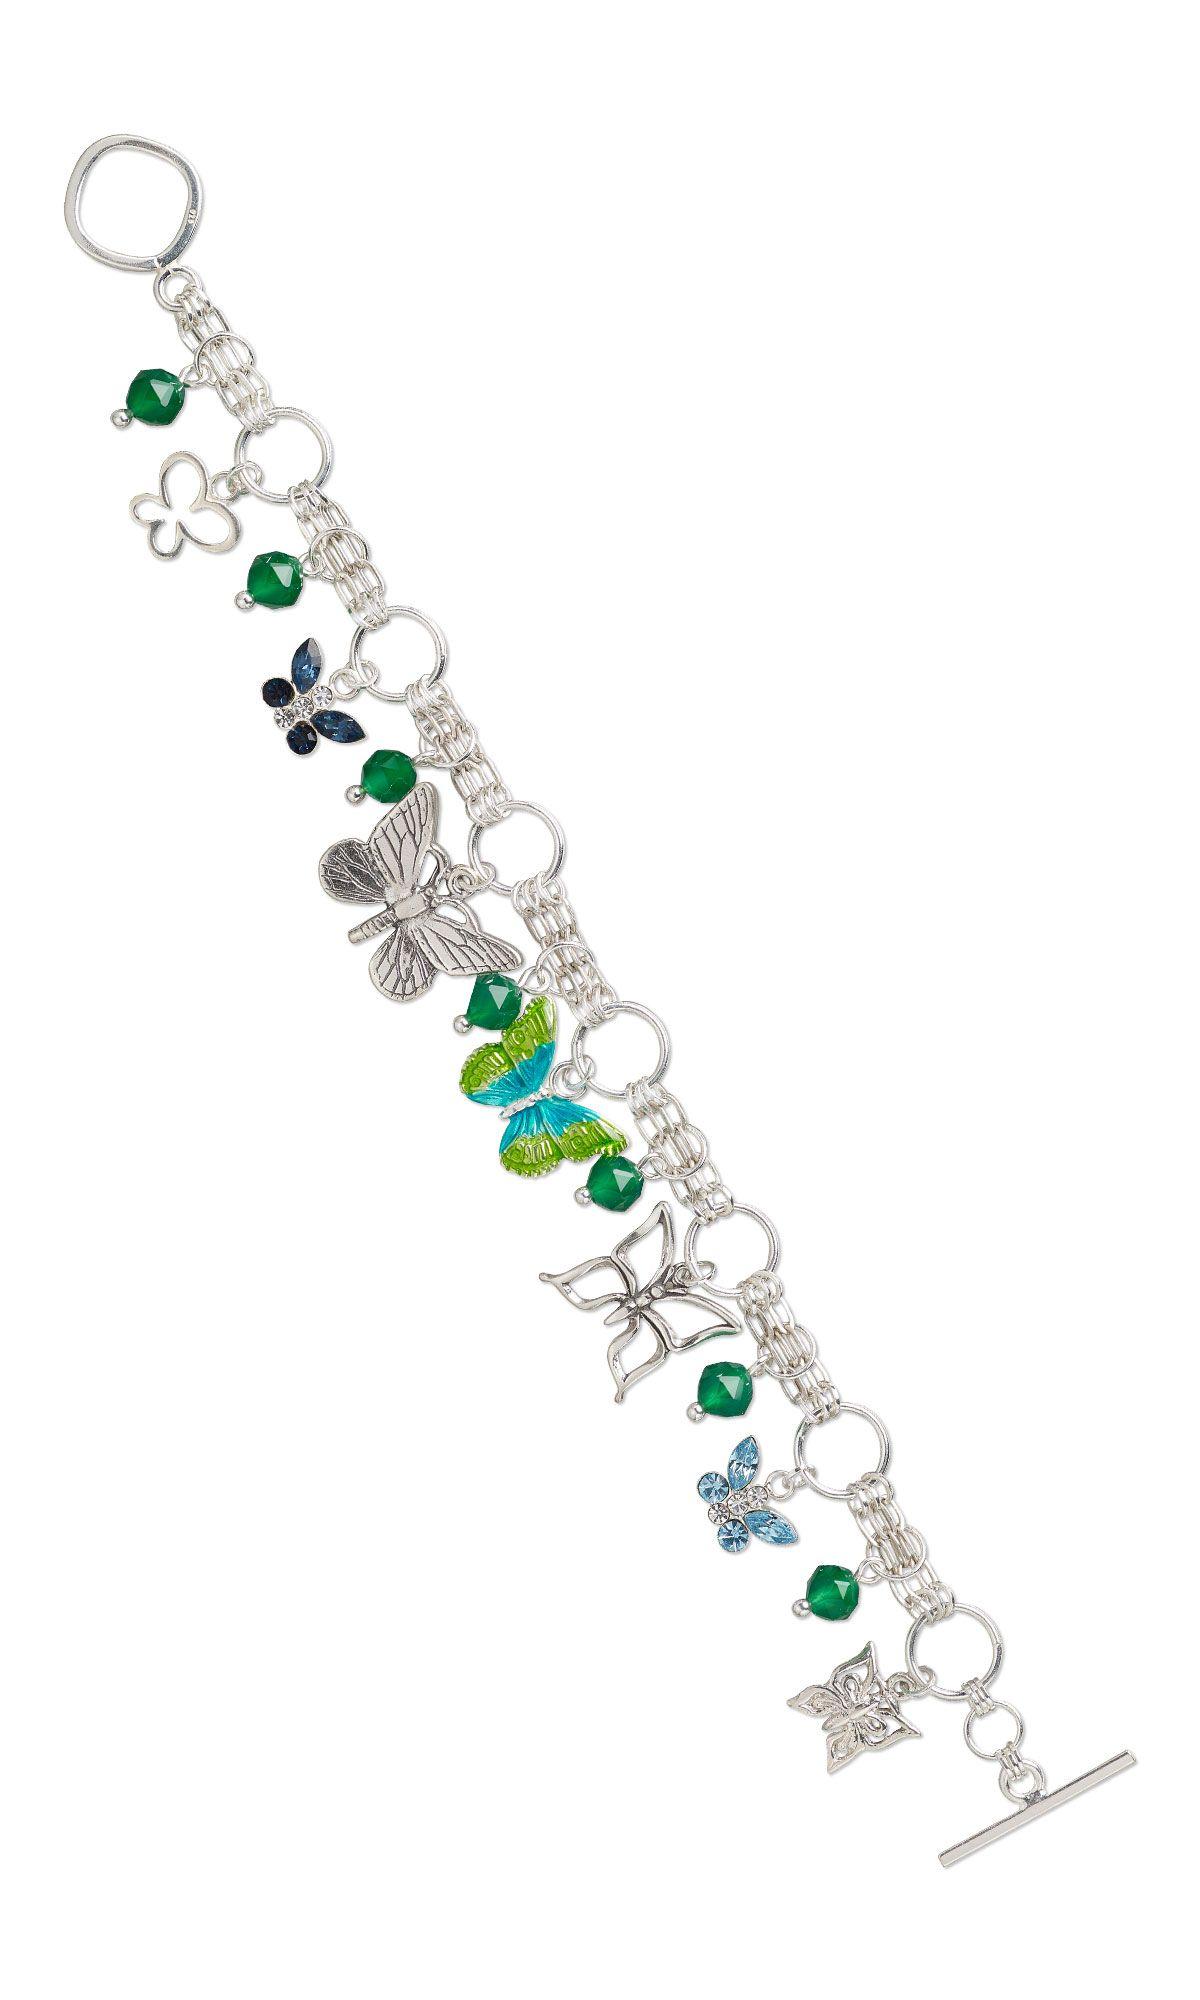 29d57d6b248 Jewelry Design - Bracelet with Sterling Silver Charms, Swarovski ...